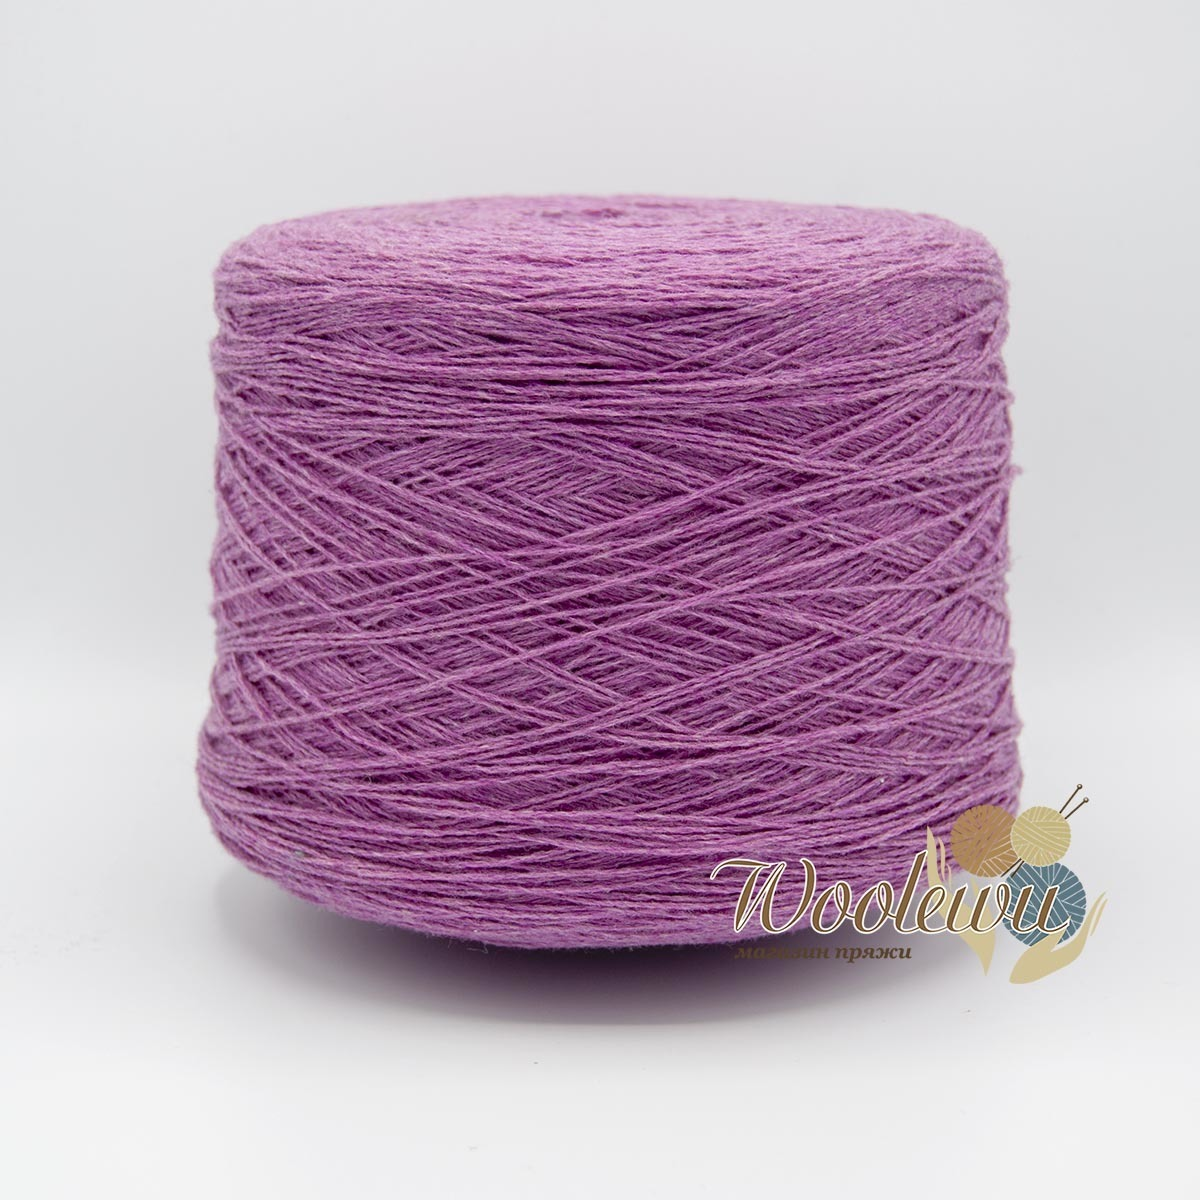 Knoll Yarns Merino Lambswool - 331